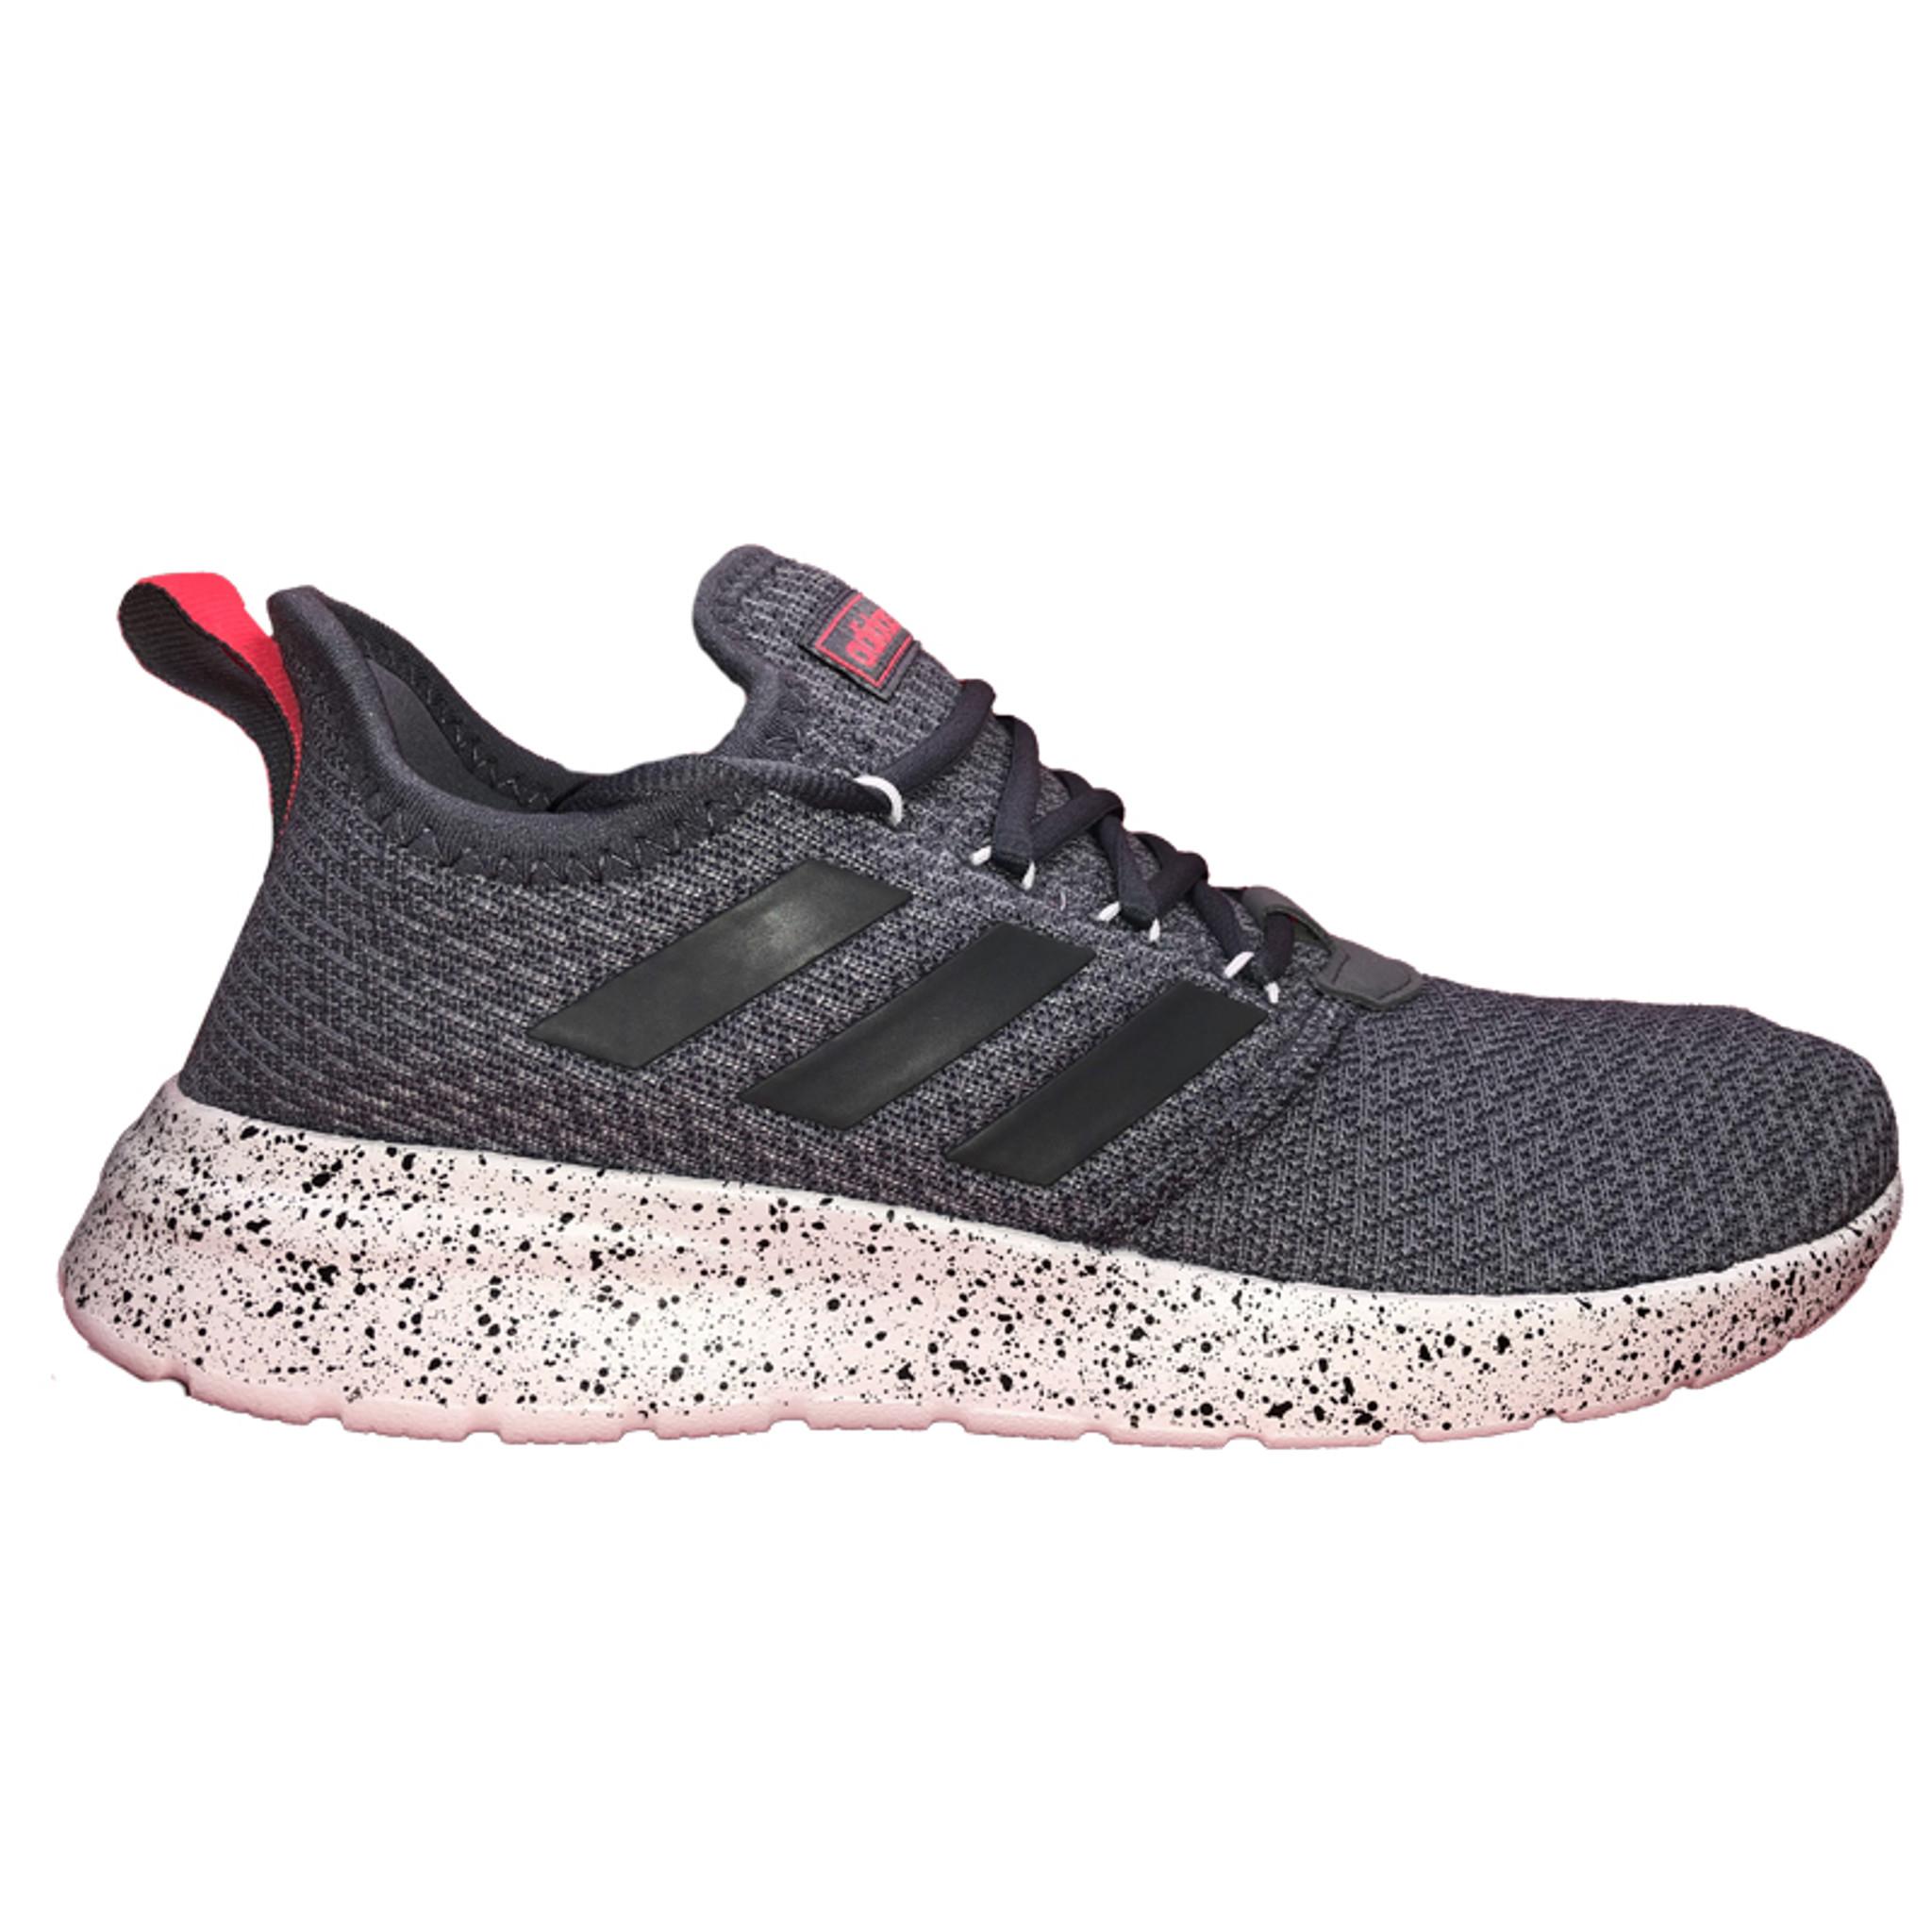 Adidas Lite Racer RBN Running Shoe